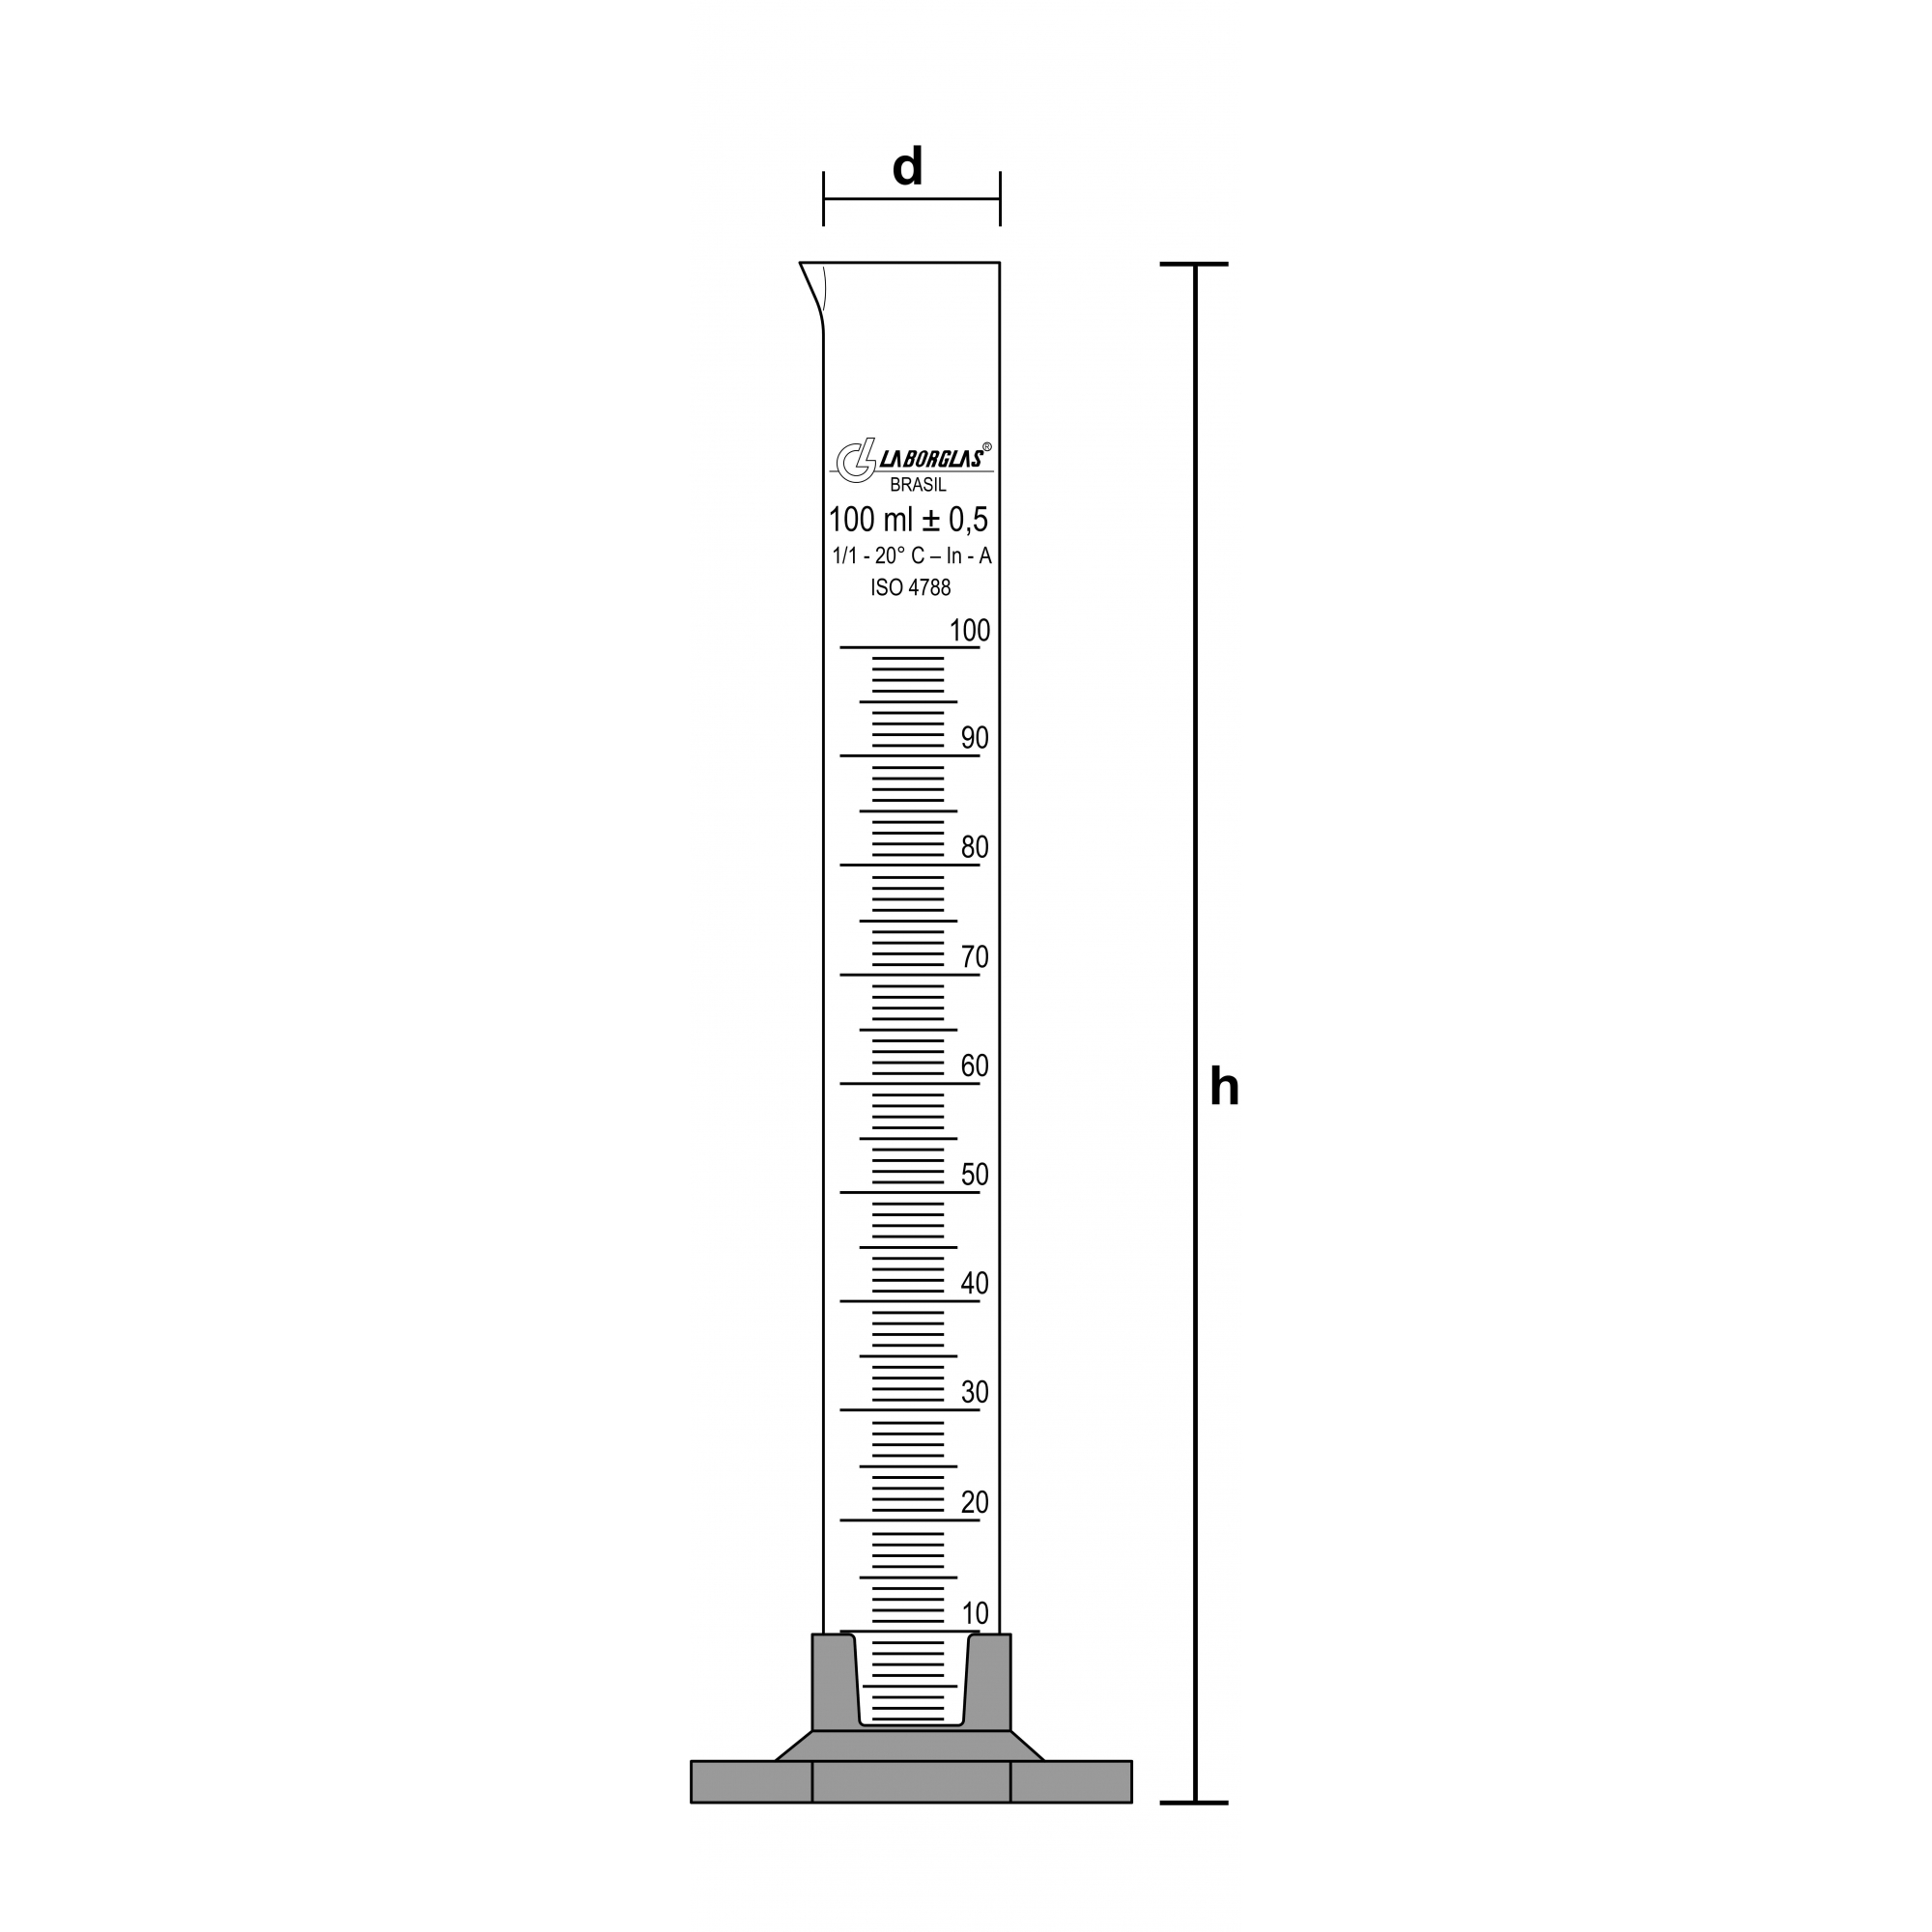 PROVETA GRADUADA BASE HEXAGONAL DE POLIPROPILENO 30 ML CLASSE A CERTIFICADO RBC - Laborglas - Cód. 9138715-R